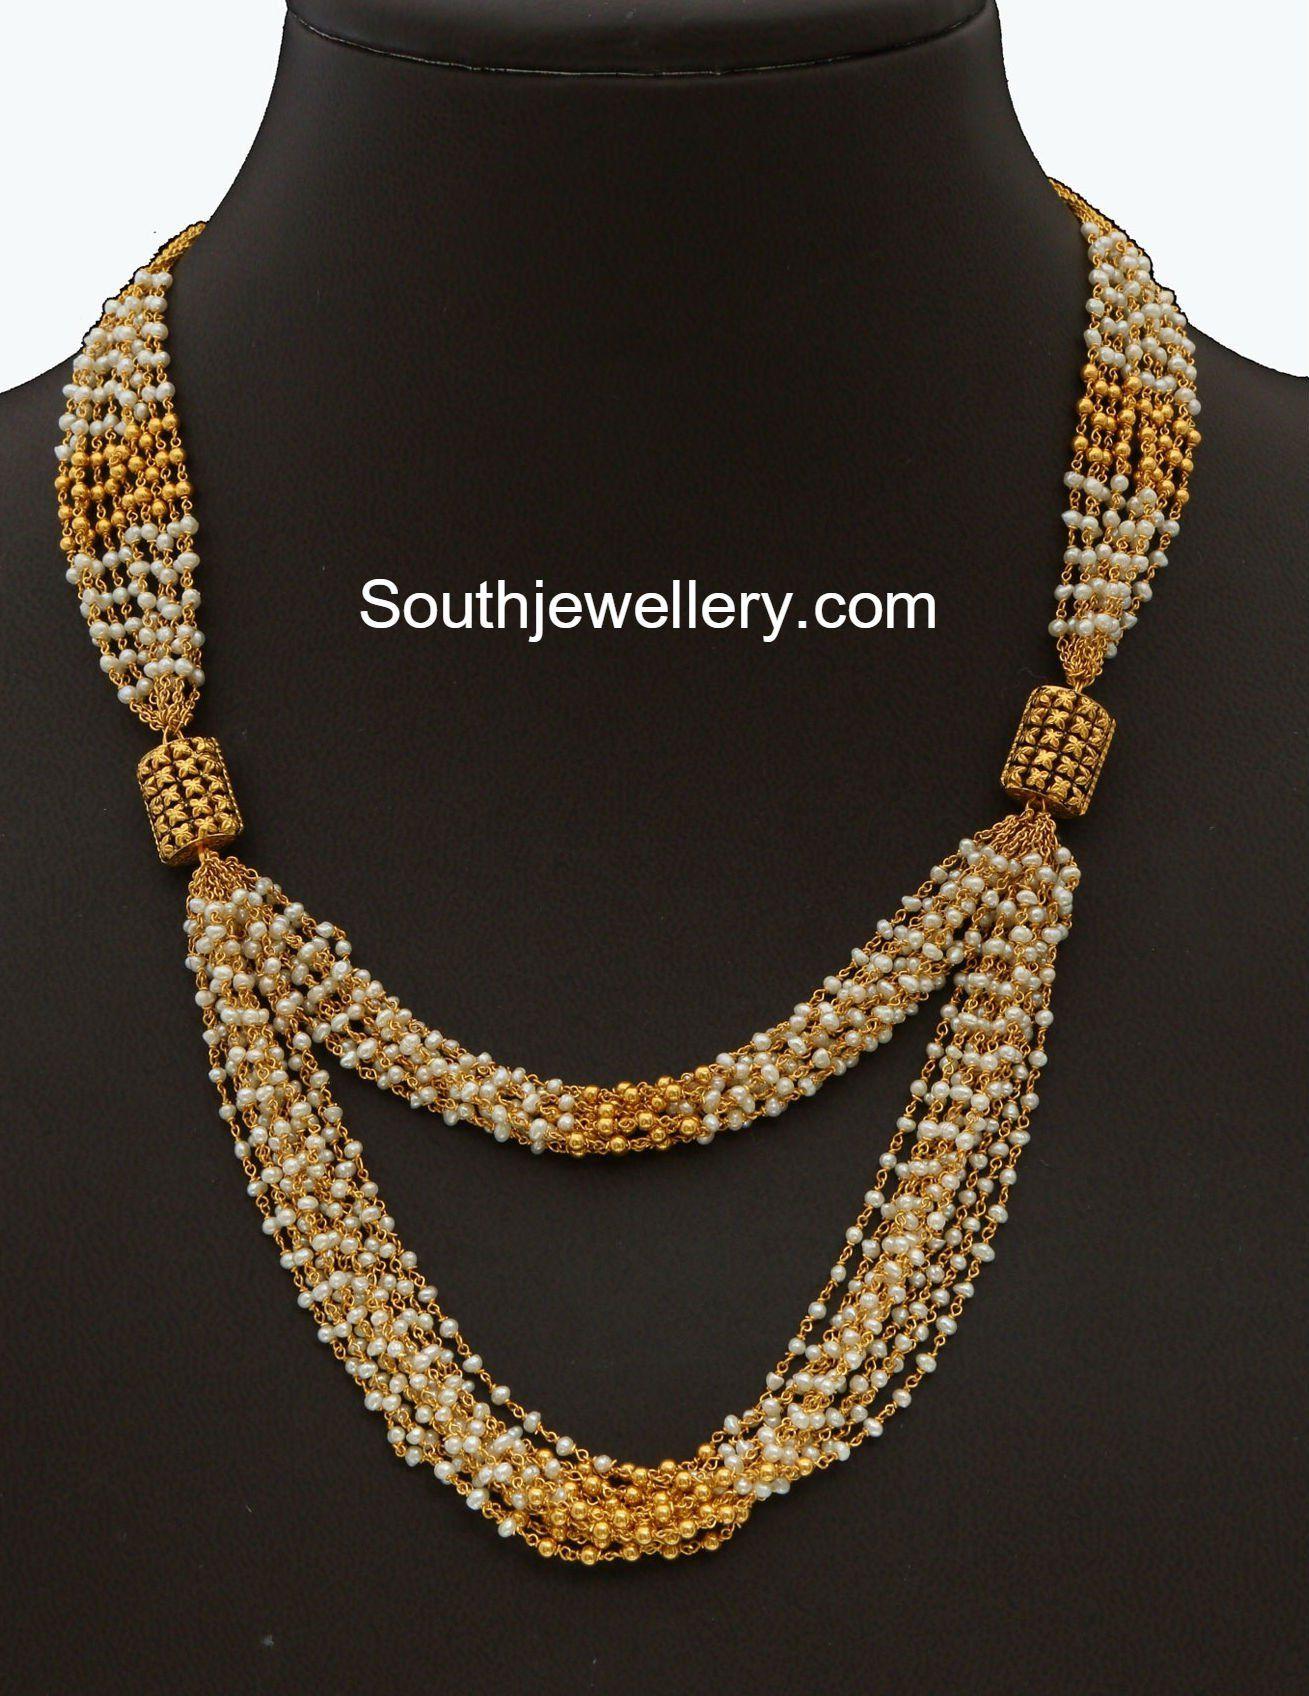 256802b83b3bc5 Light Weight Pearls Mala | jewelry in 2019 | Jewelry, Indian ...